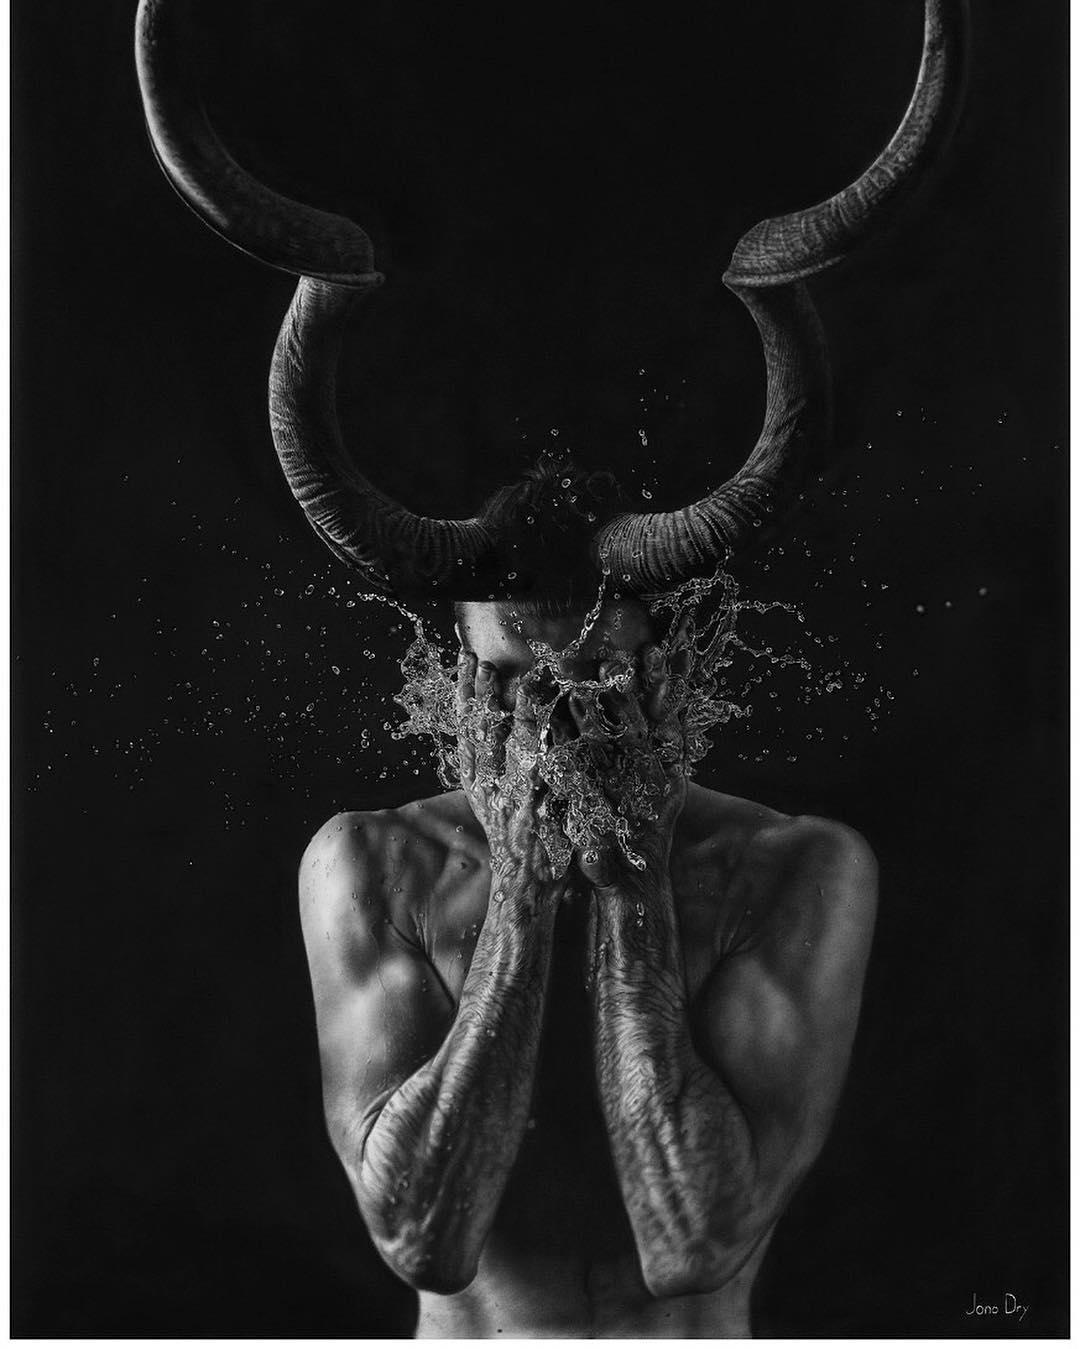 Фотореализм и сюрреализм в картинах Джоно Драйя